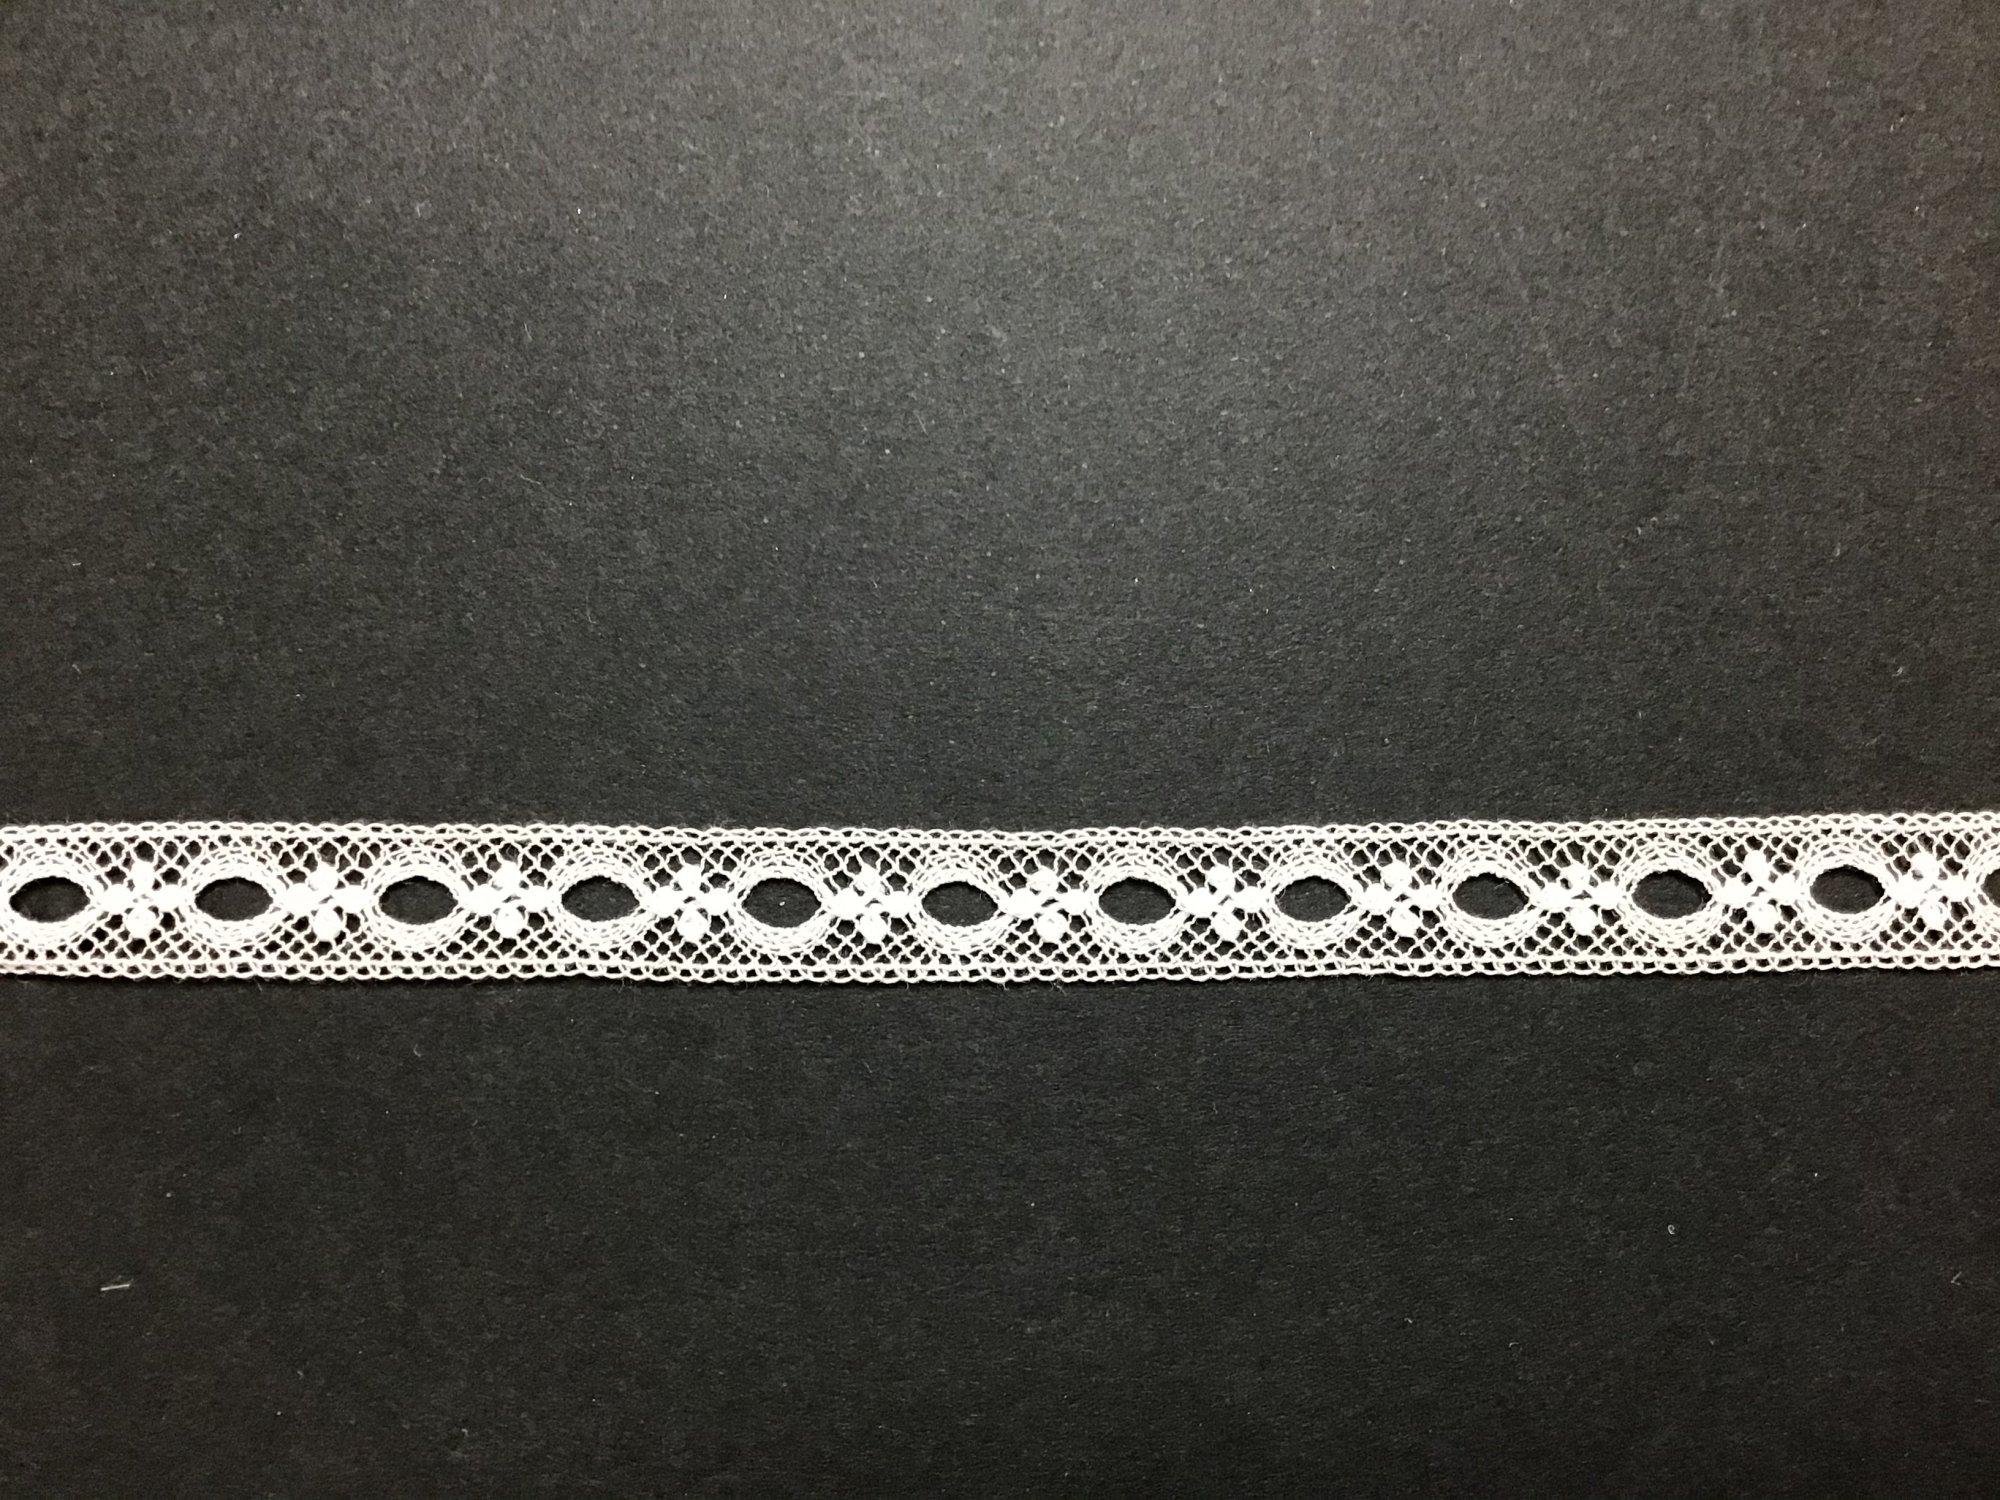 Maline Lace Beading .25 inch White 200129-04